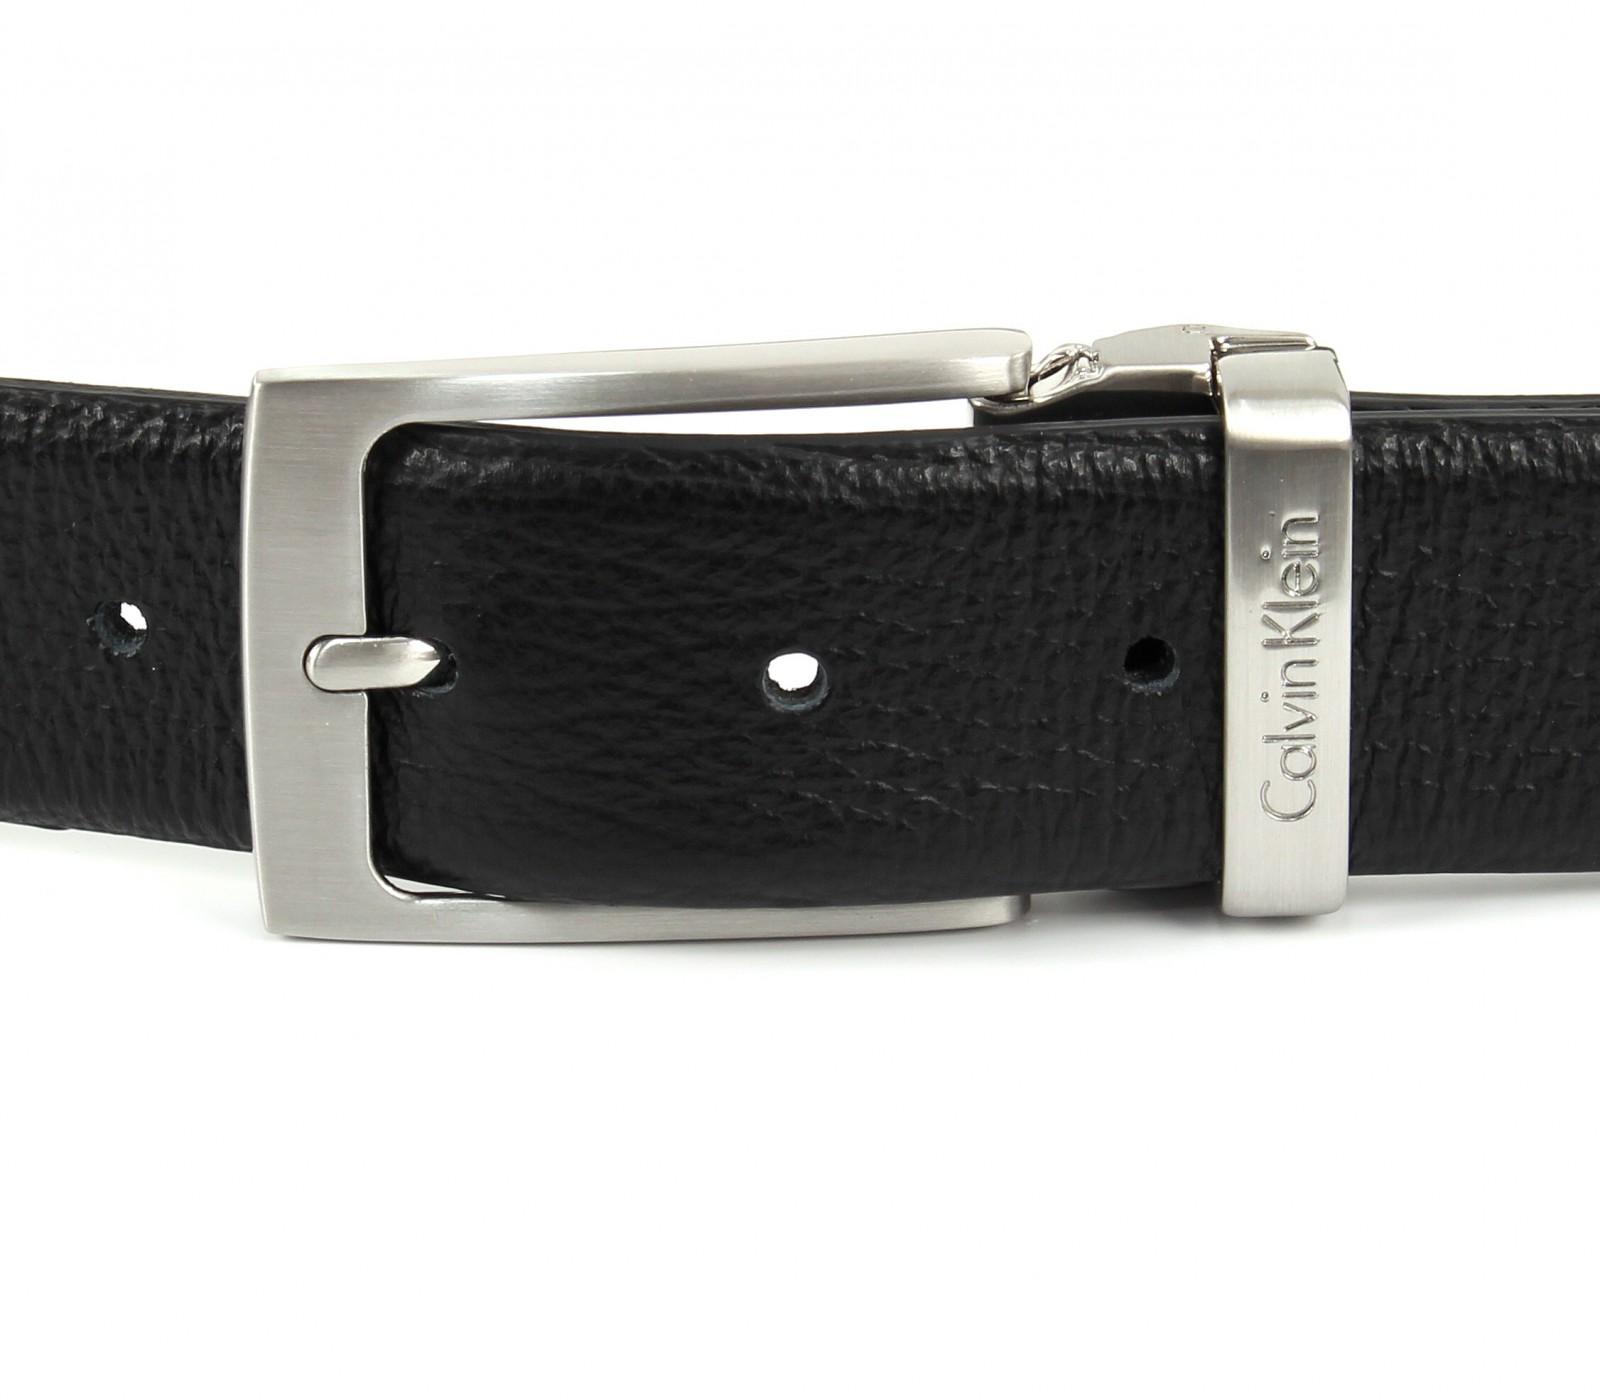 Calvin Klein Stand Alone Adjustable Pebble Belt W105 Black